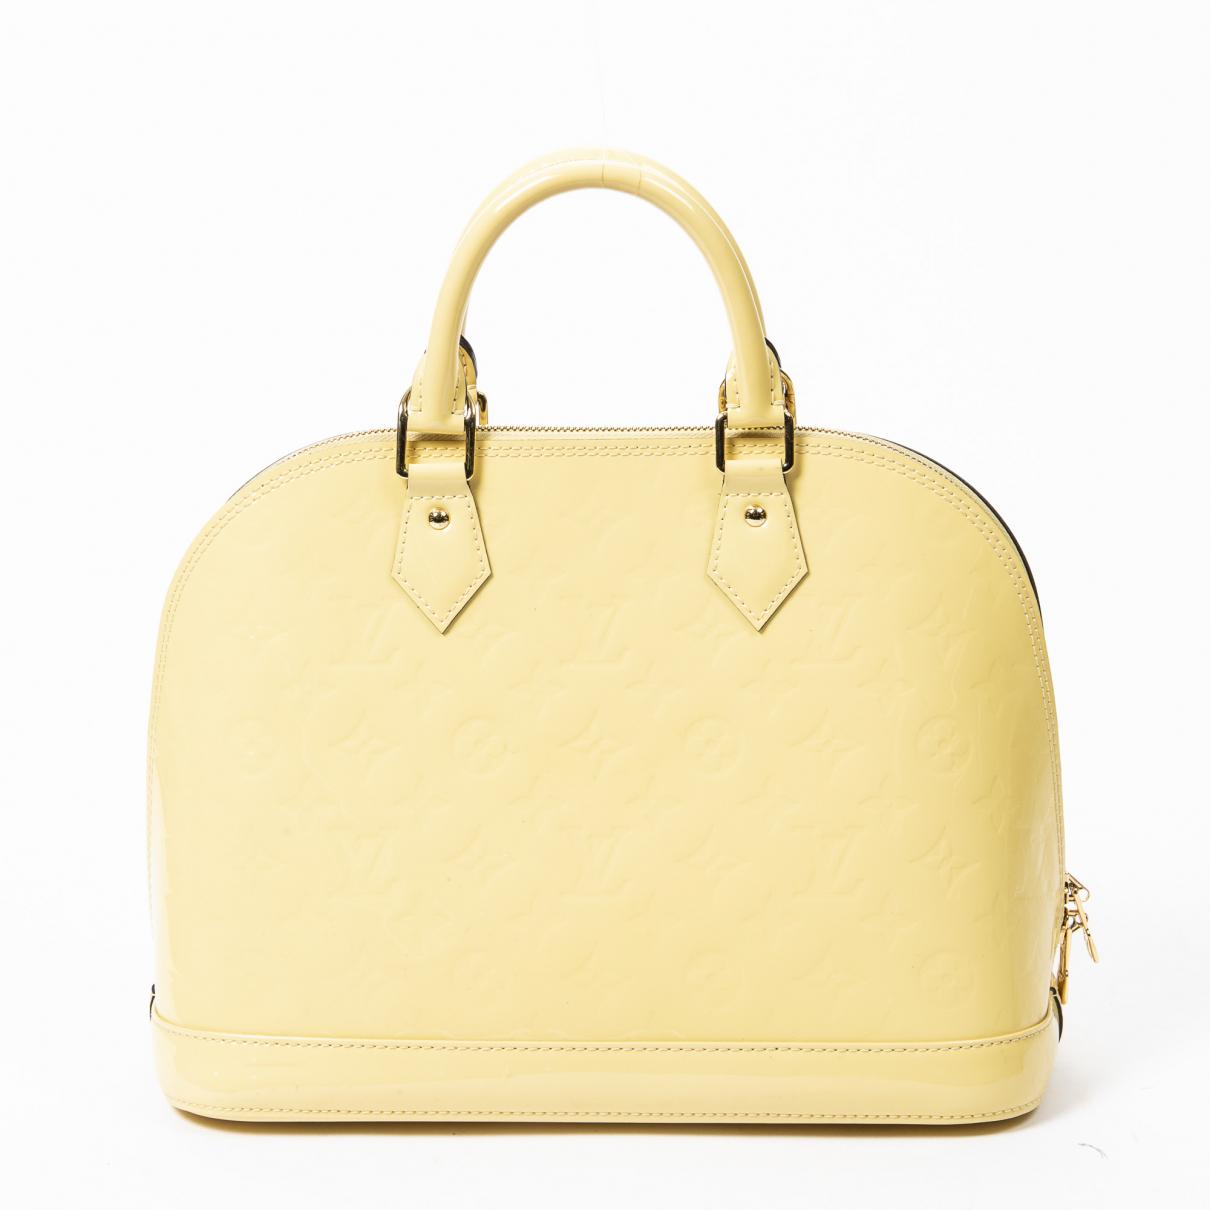 Louis Vuitton - Sac a main Alma pour femme en cuir verni - jaune